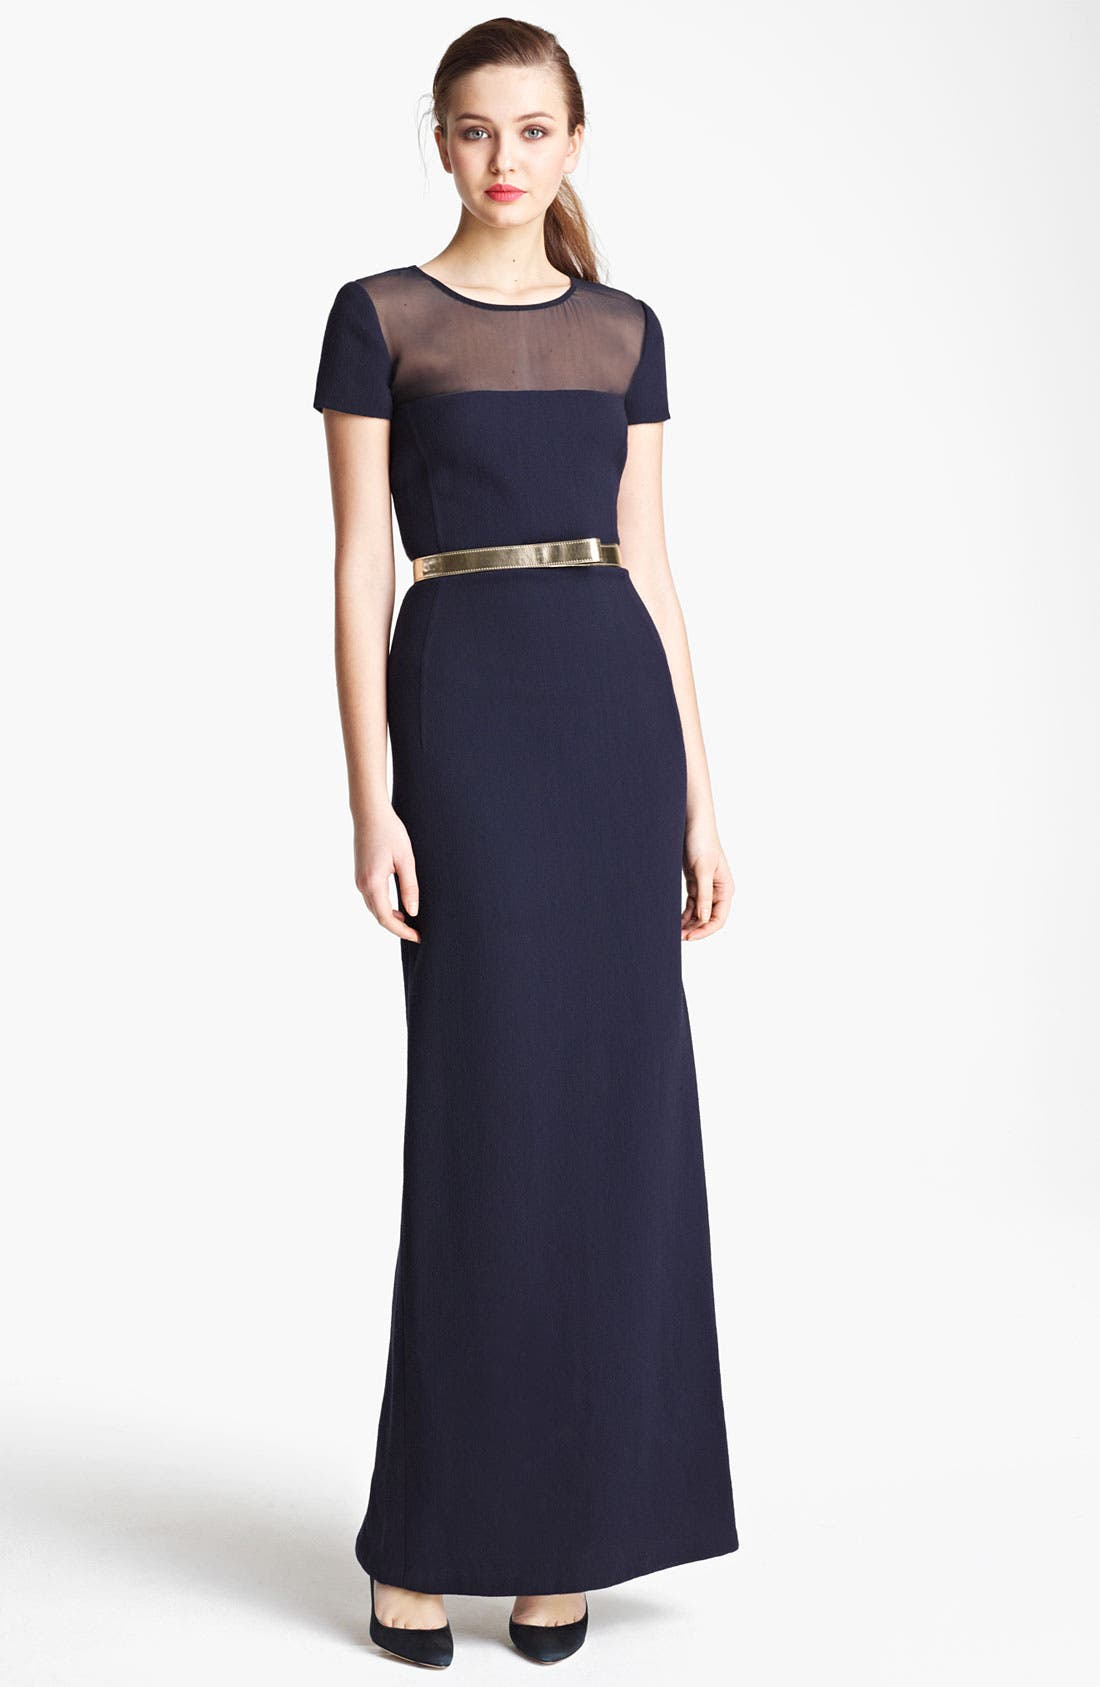 Main Image - Oscar de la Renta Illusion Bodice Gown